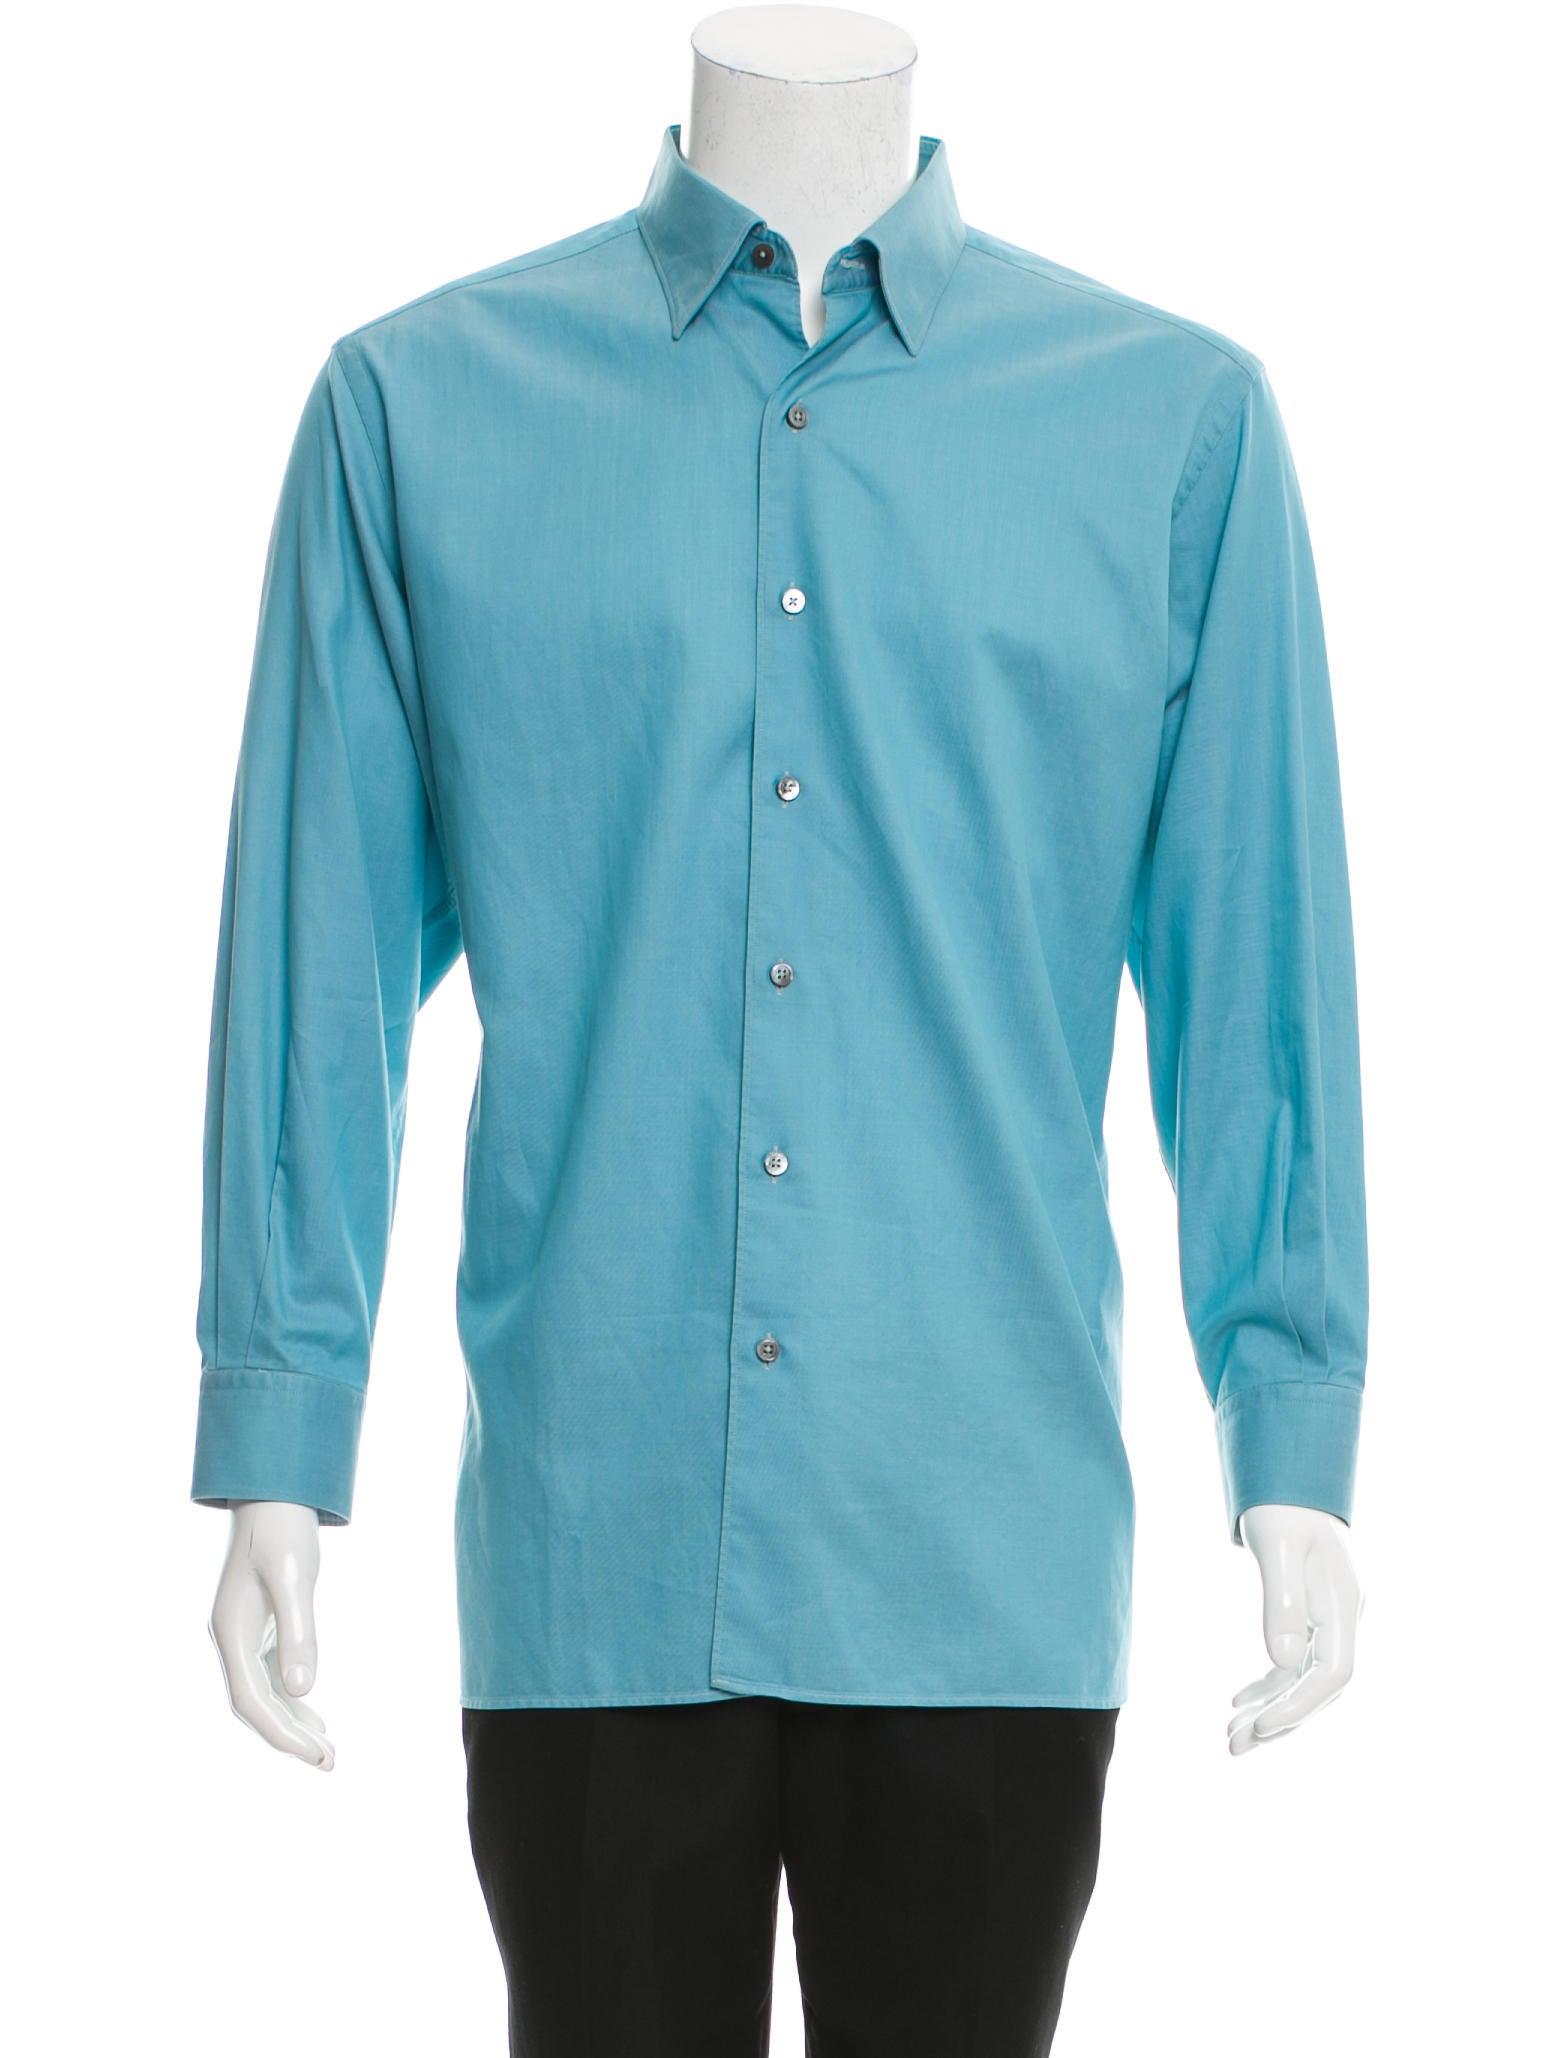 ermenegildo zegna woven button up shirt clothing zgn24407 the realreal. Black Bedroom Furniture Sets. Home Design Ideas